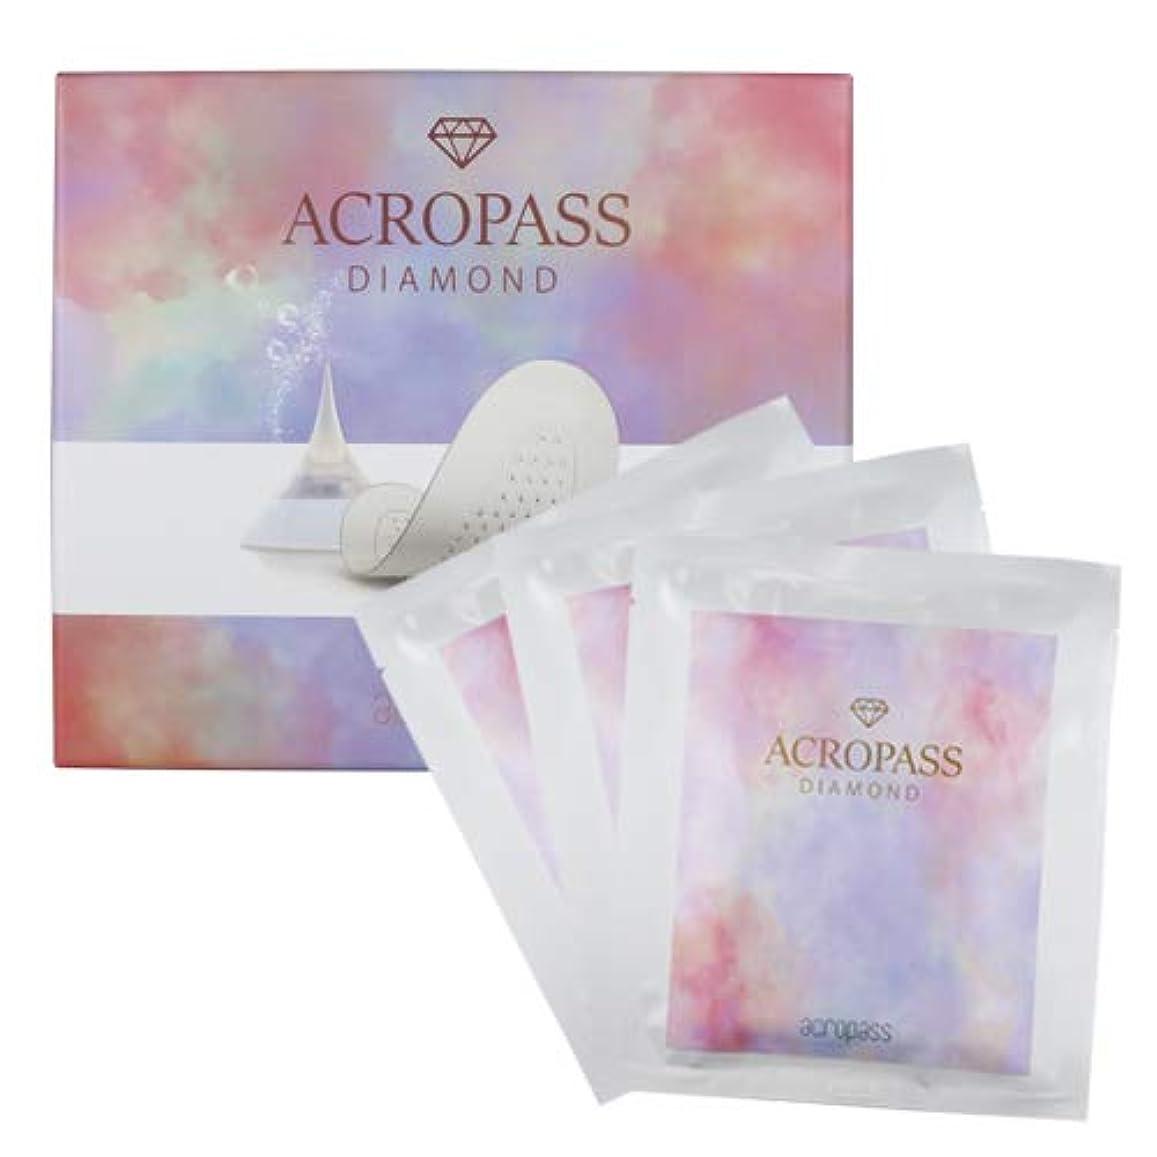 acropass アクロパス ダイアモンド (ACROPASS DIAMOND) 6パッチ(3パウチ)入り